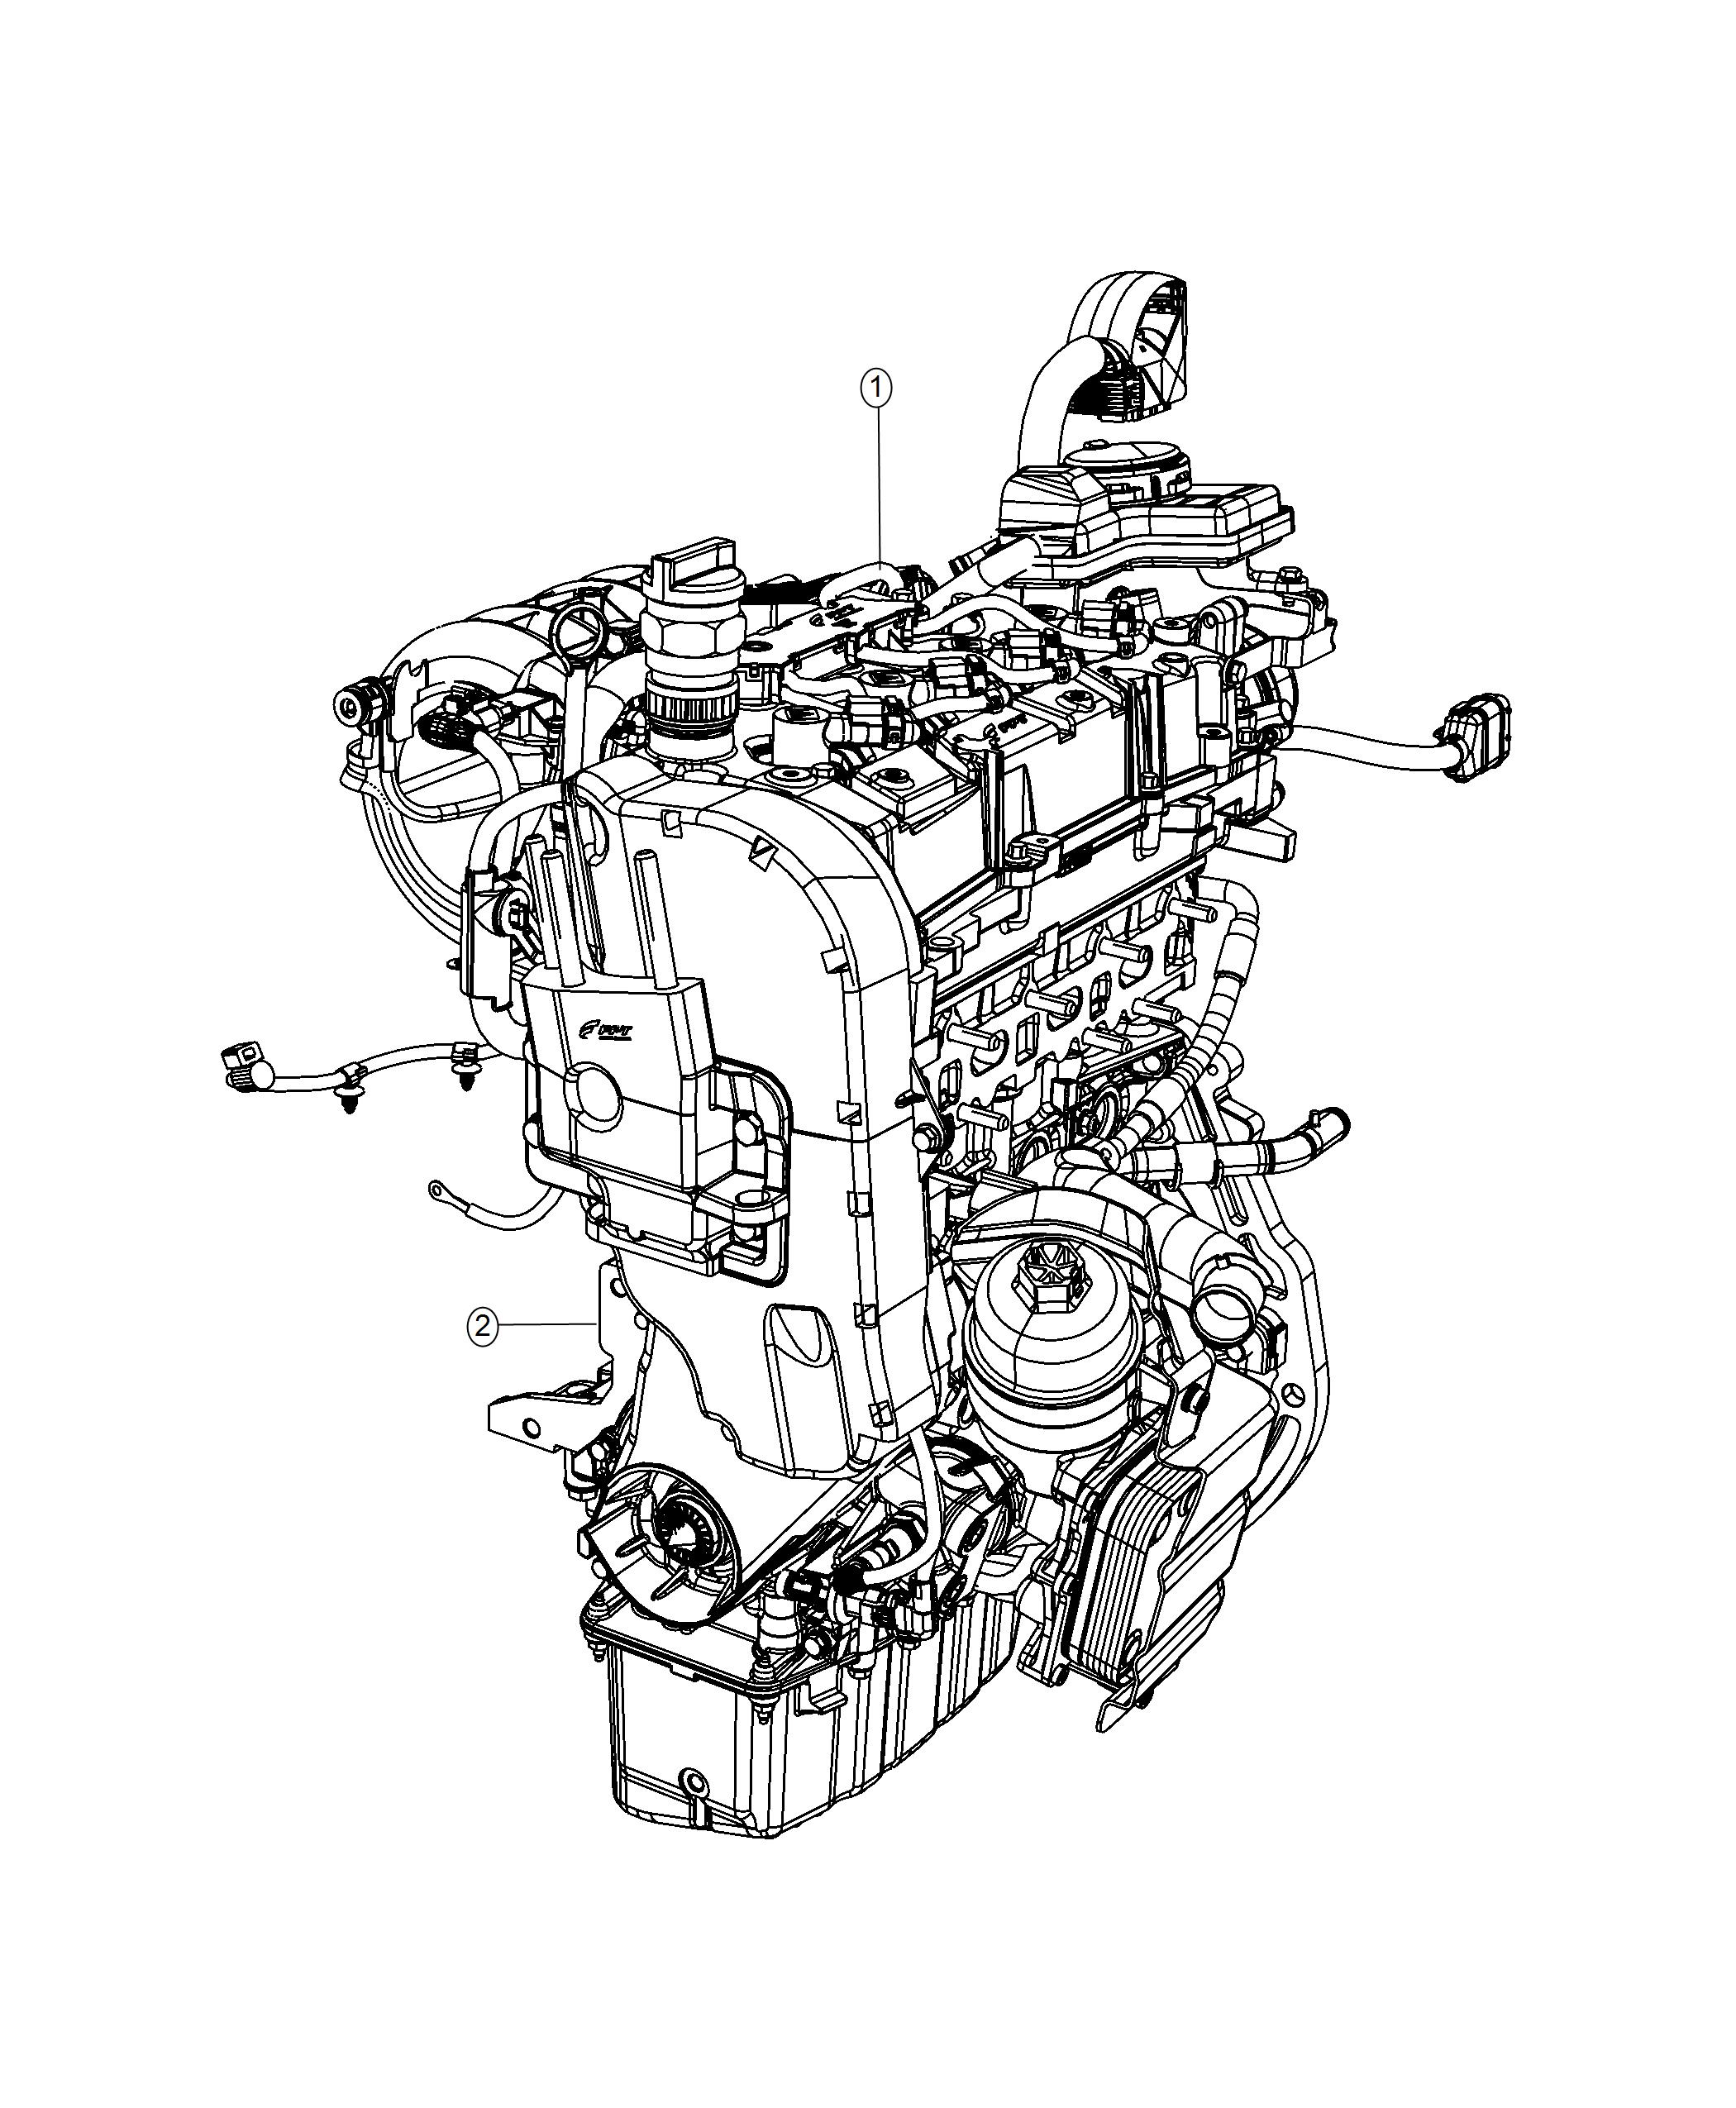 Fiat 124 Spider Engine Long Block Turbocharged Service